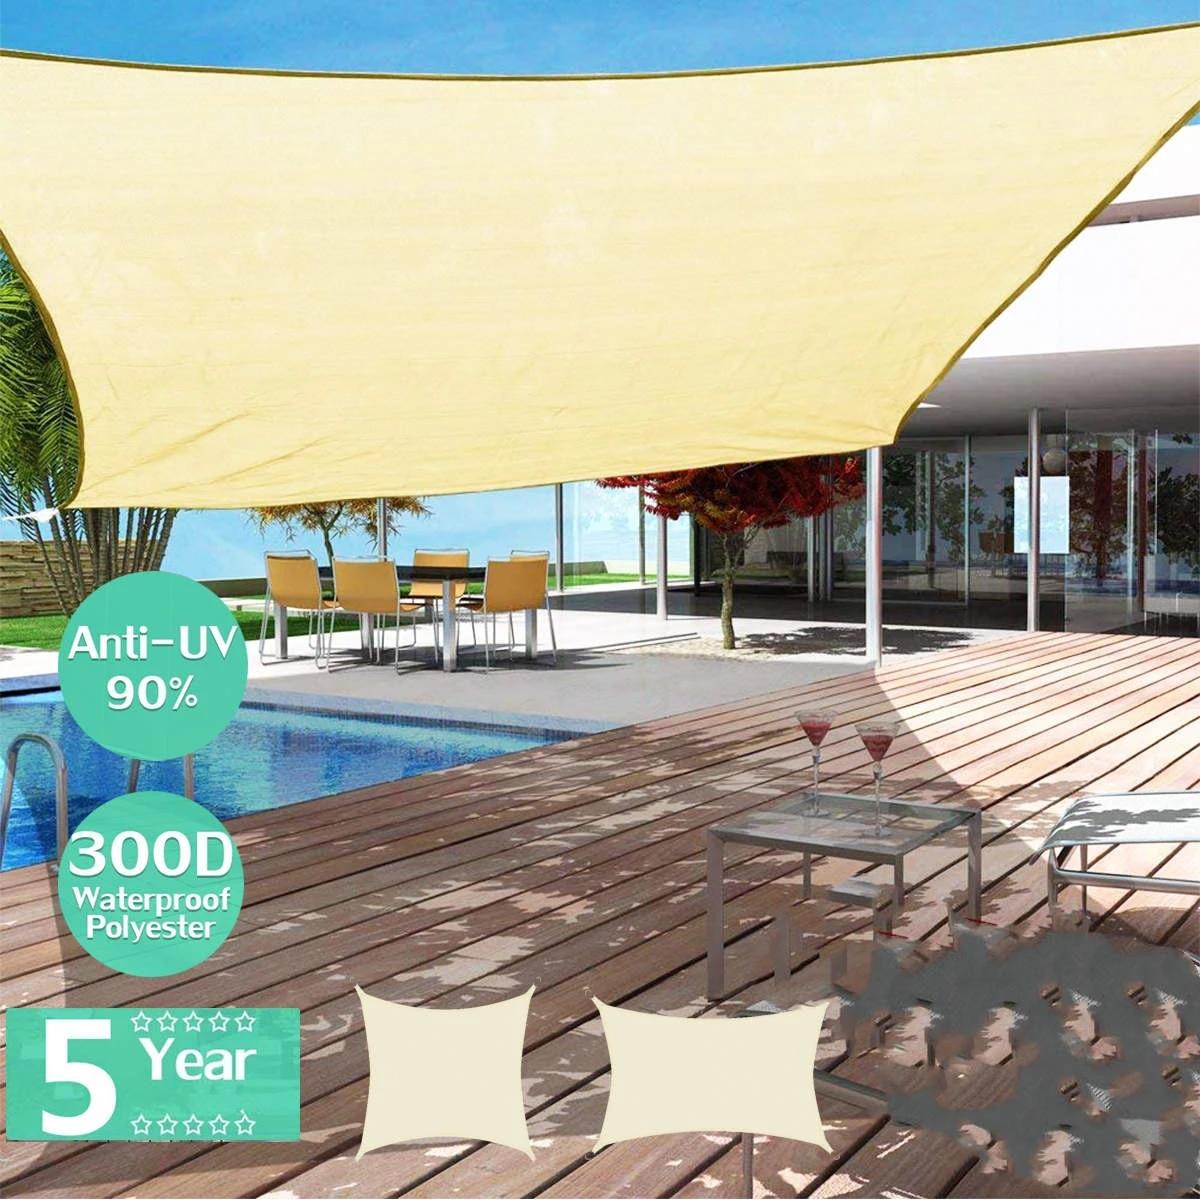 waterproof sun shelter sunshade outdoor sun sail canopy garden patio pool shade sail awning camping shade cloth large